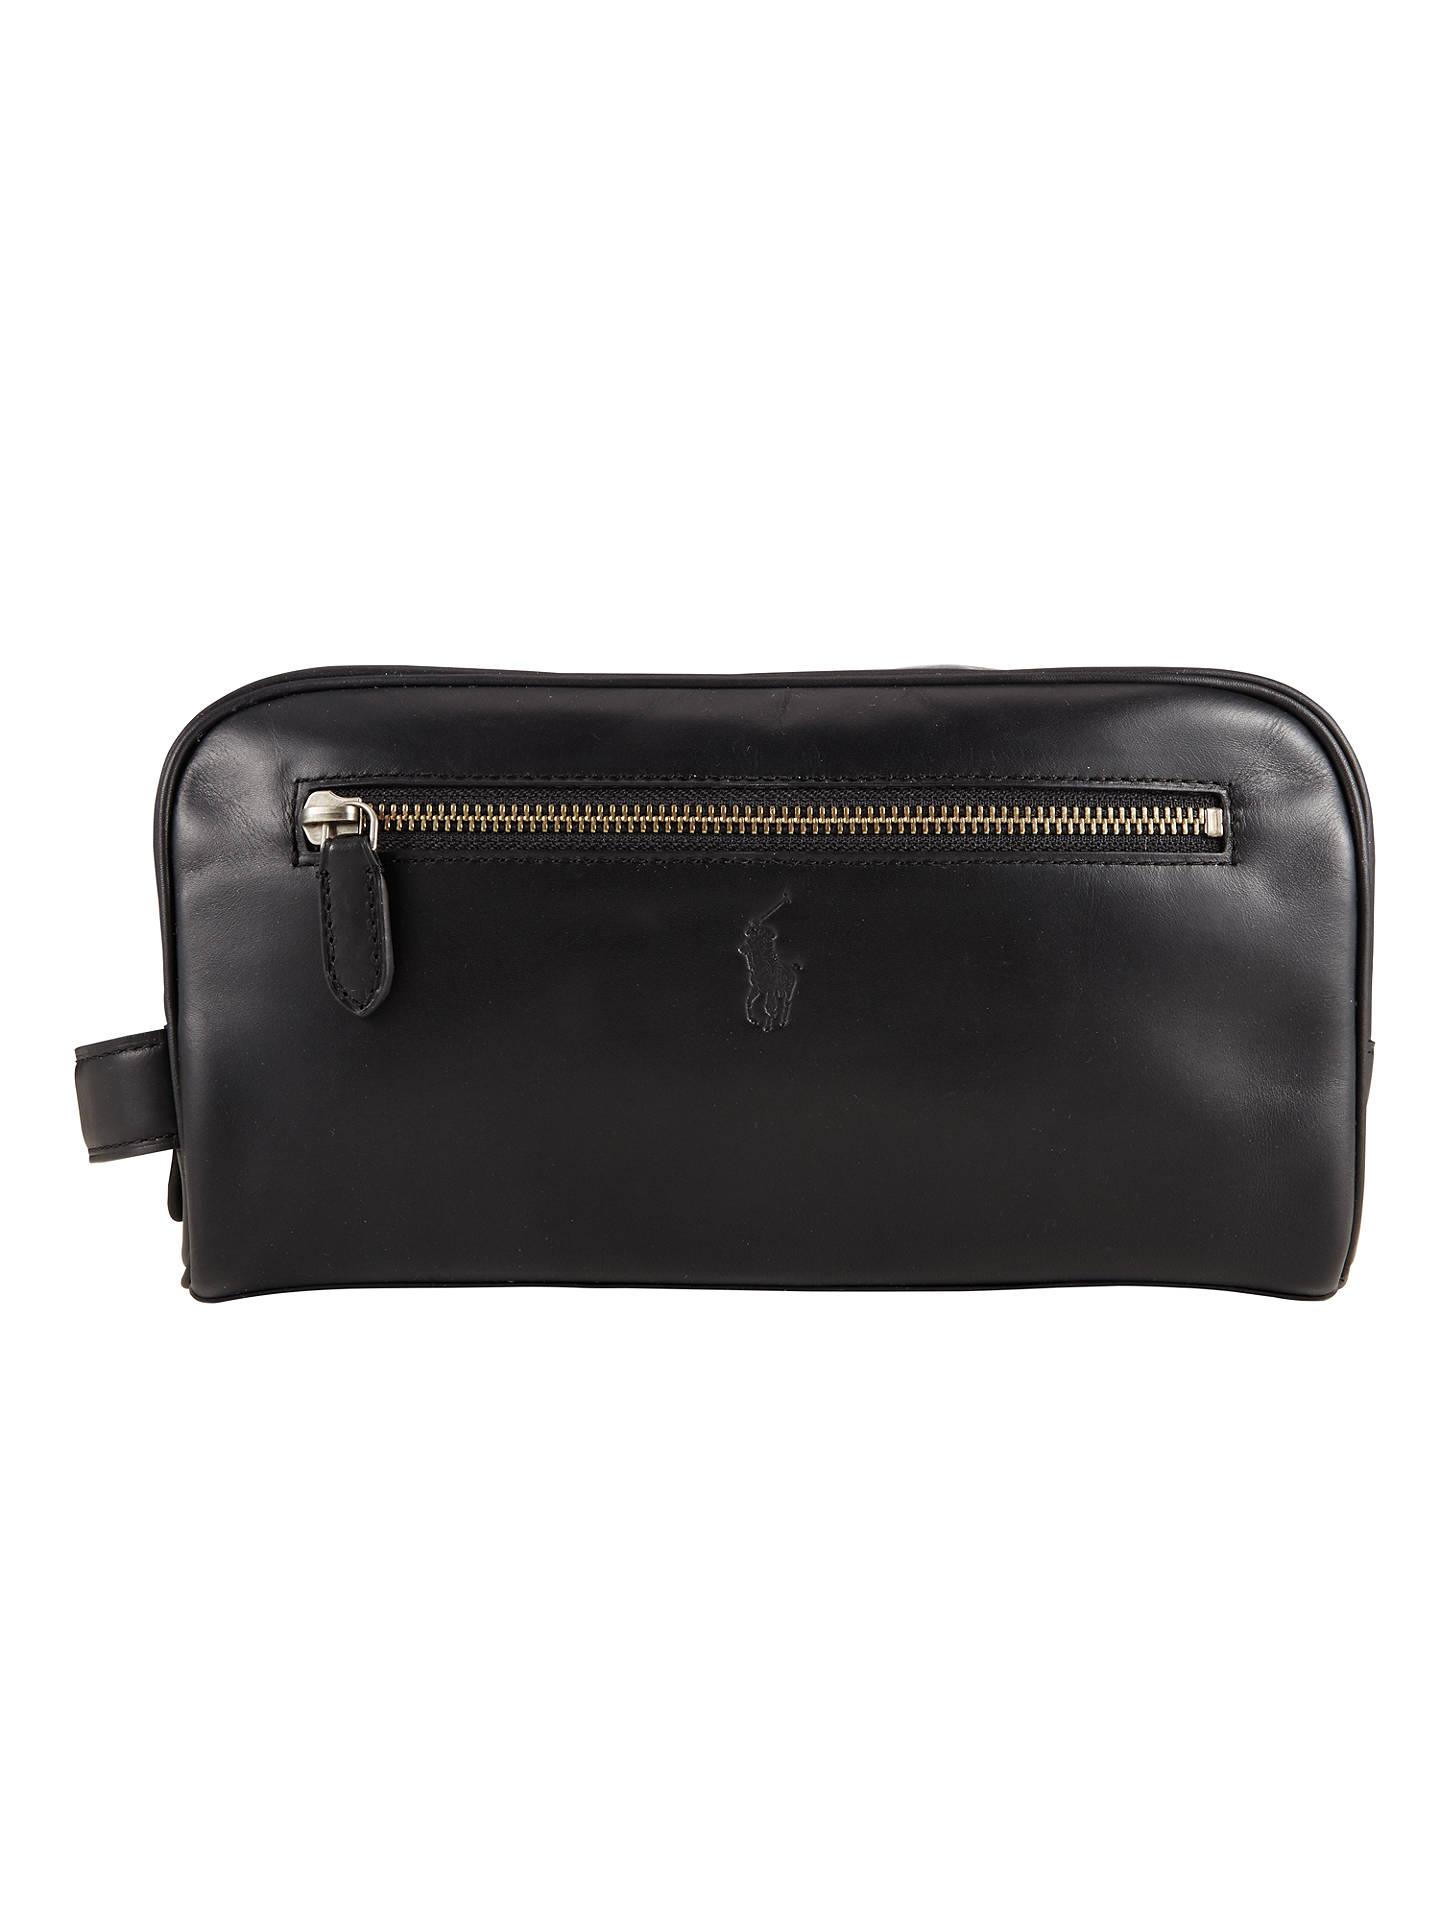 BuyPolo Ralph Lauren Leather Shaving Kit 5bcfbd9bfc3d0